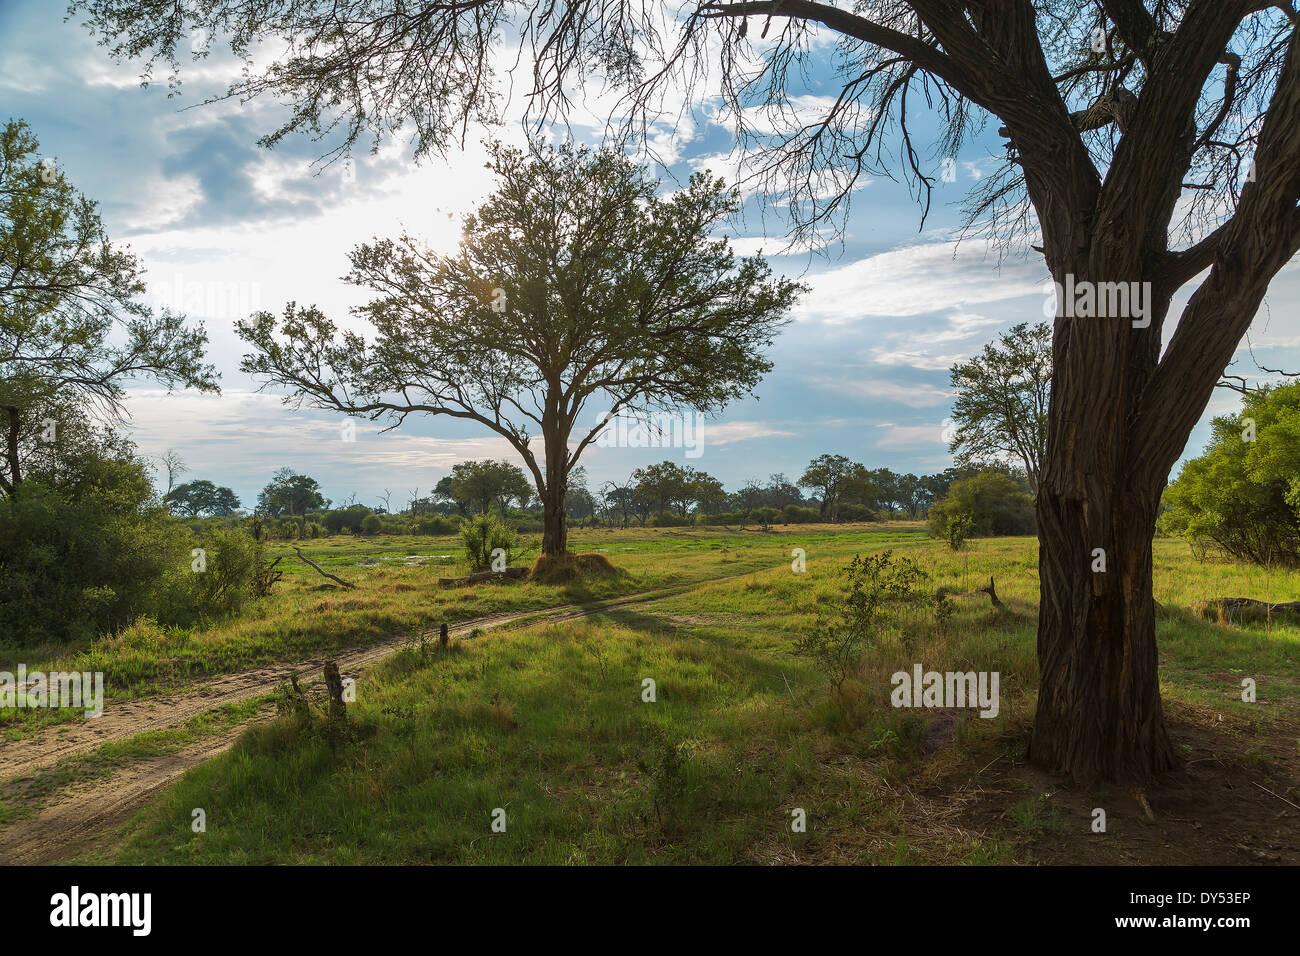 Trees and dirt track, Okavango Delta, Chobe National Park, Botswana, Africa - Stock Image